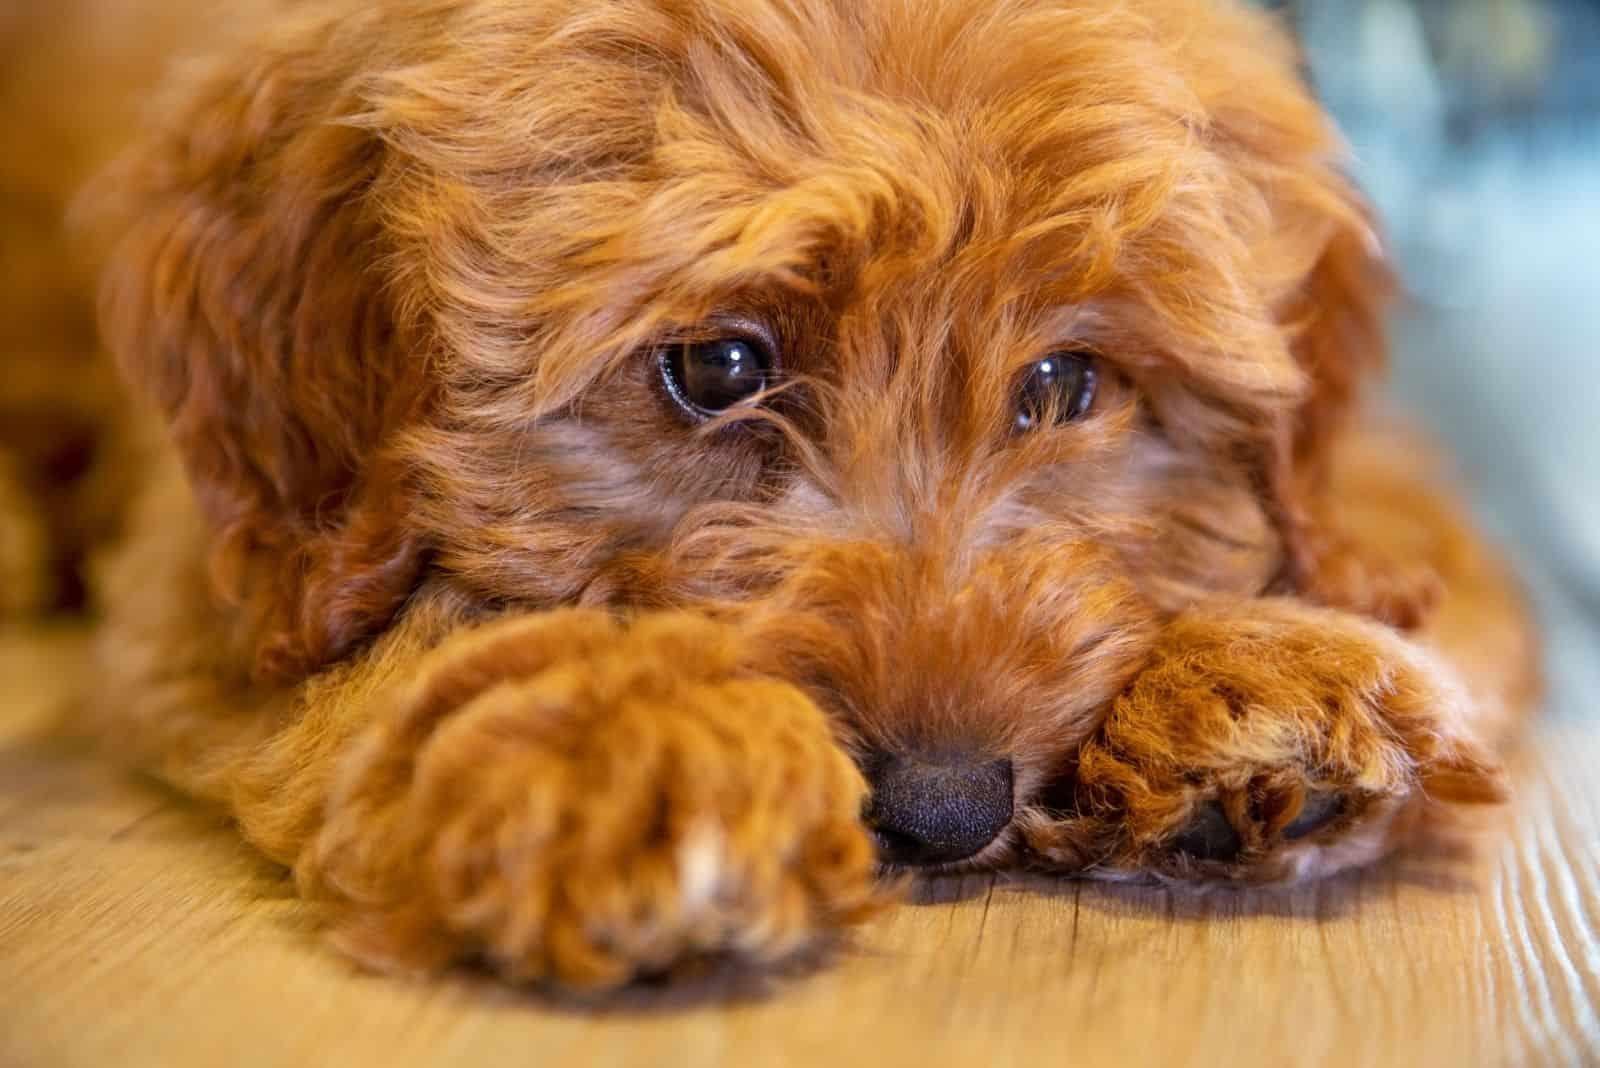 cute puppy dog looking sad